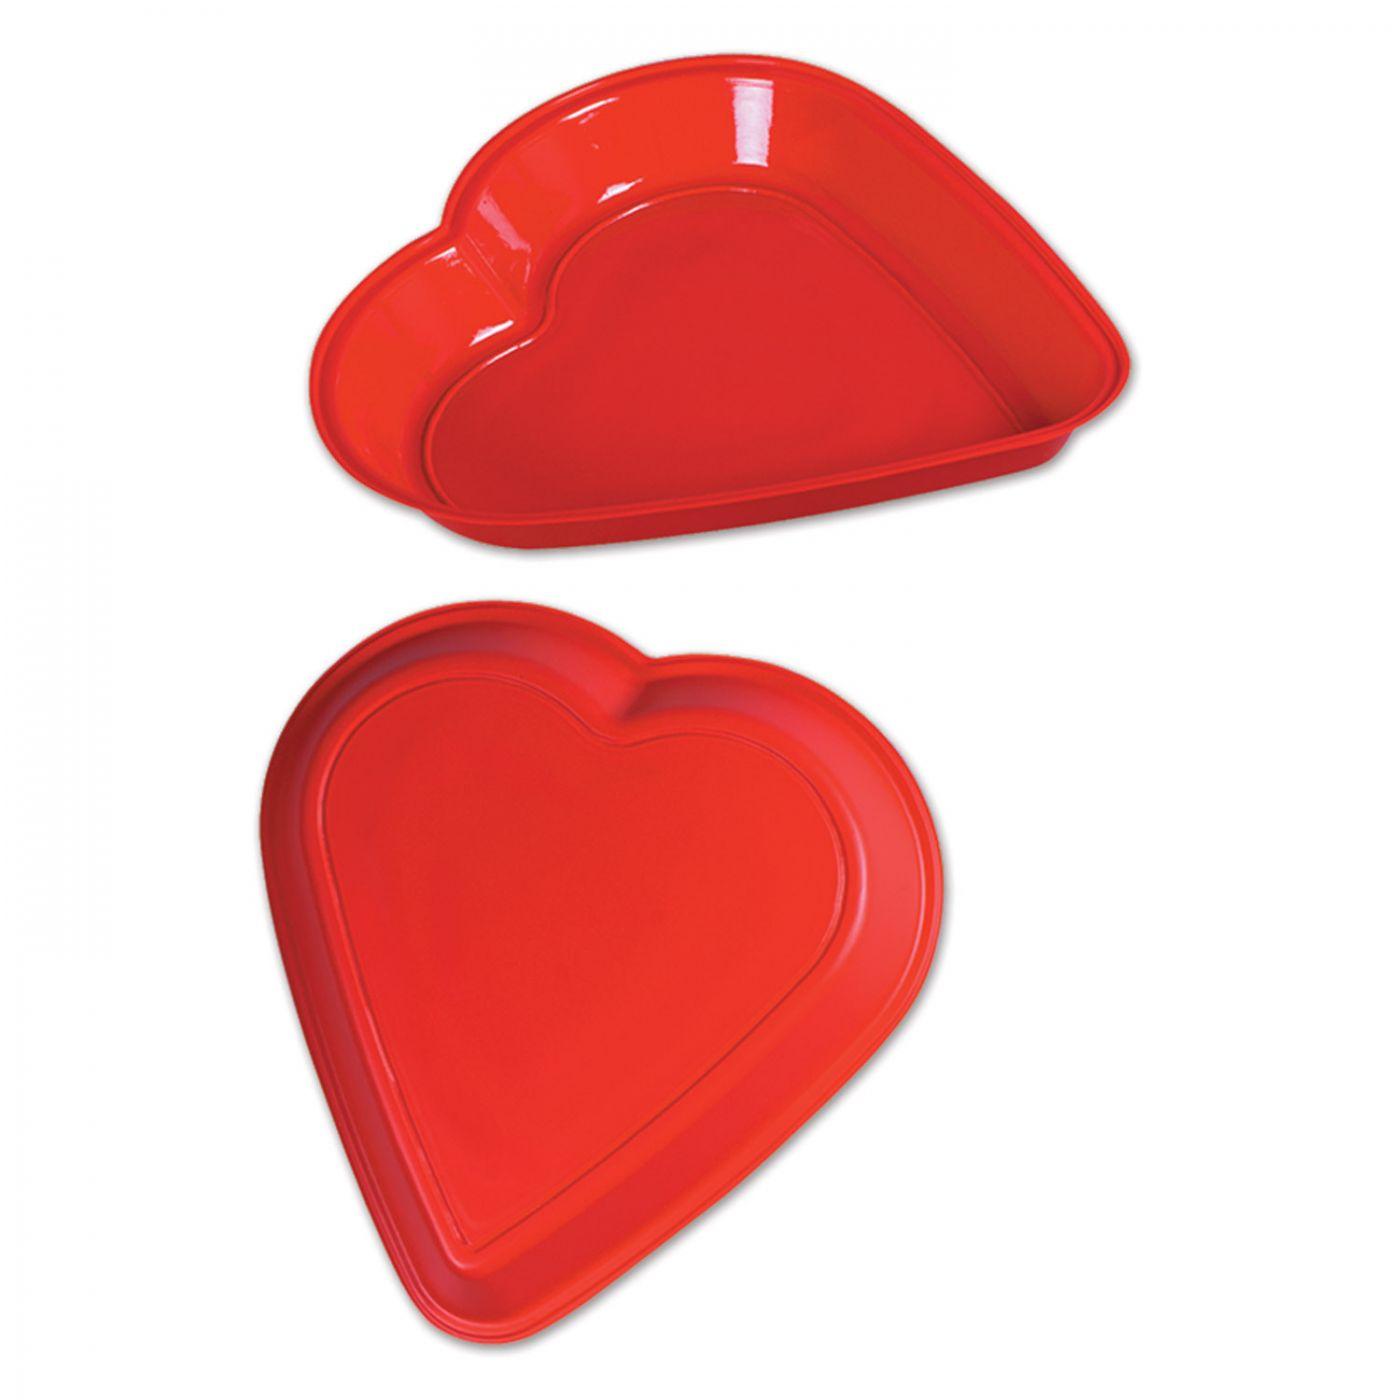 Plastic Heart Tray (24) image